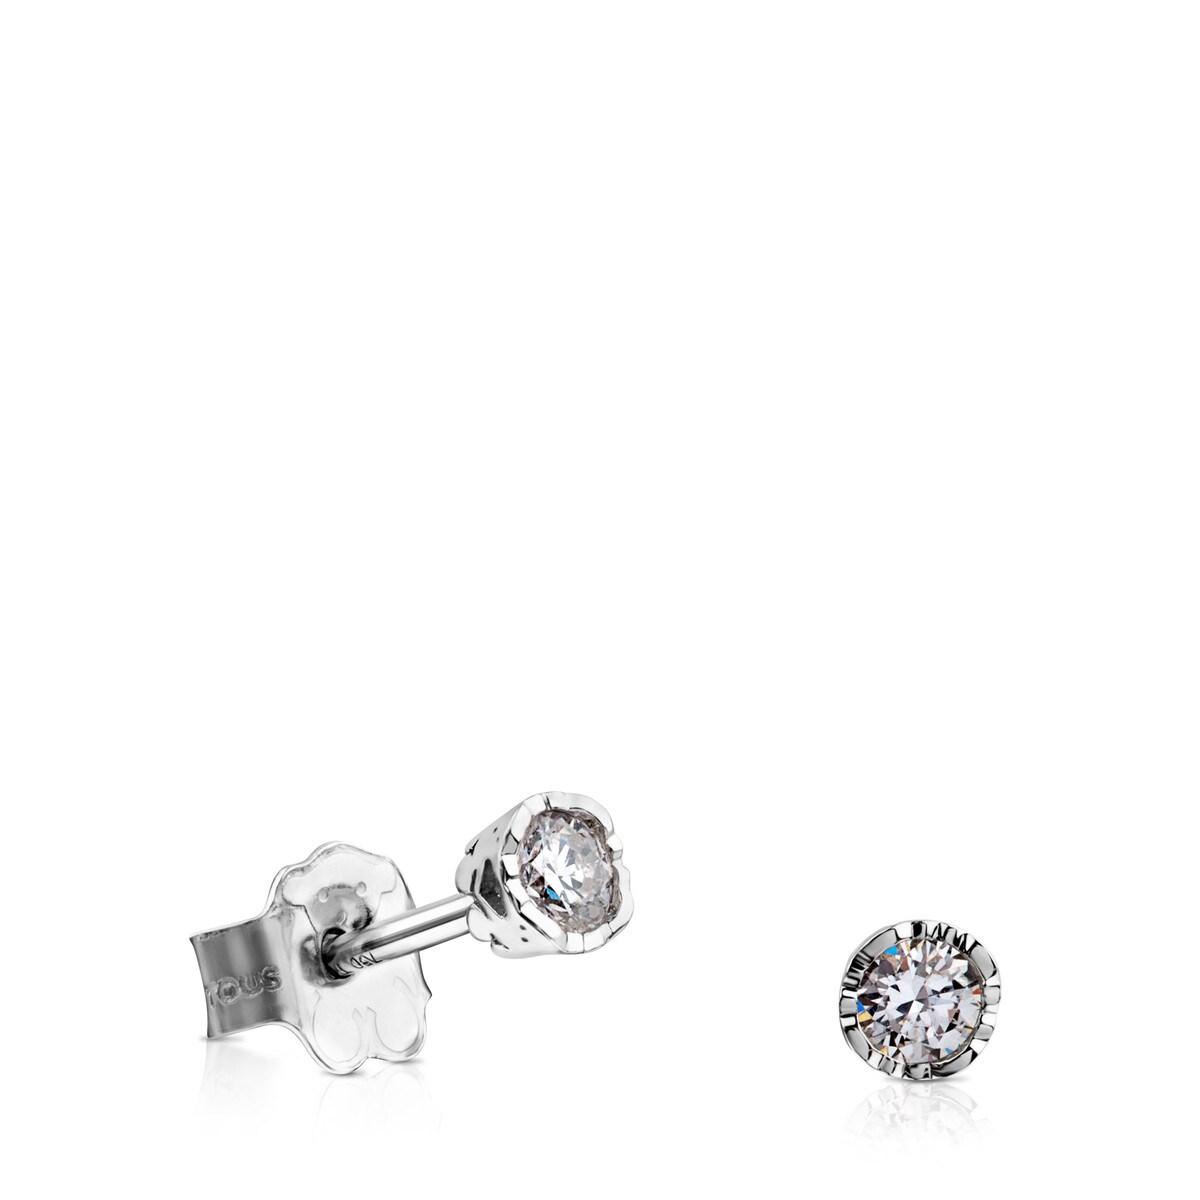 82e237df0518 Aretes Boca Osos de Oro blanco y Diamantes - Tous Site MX